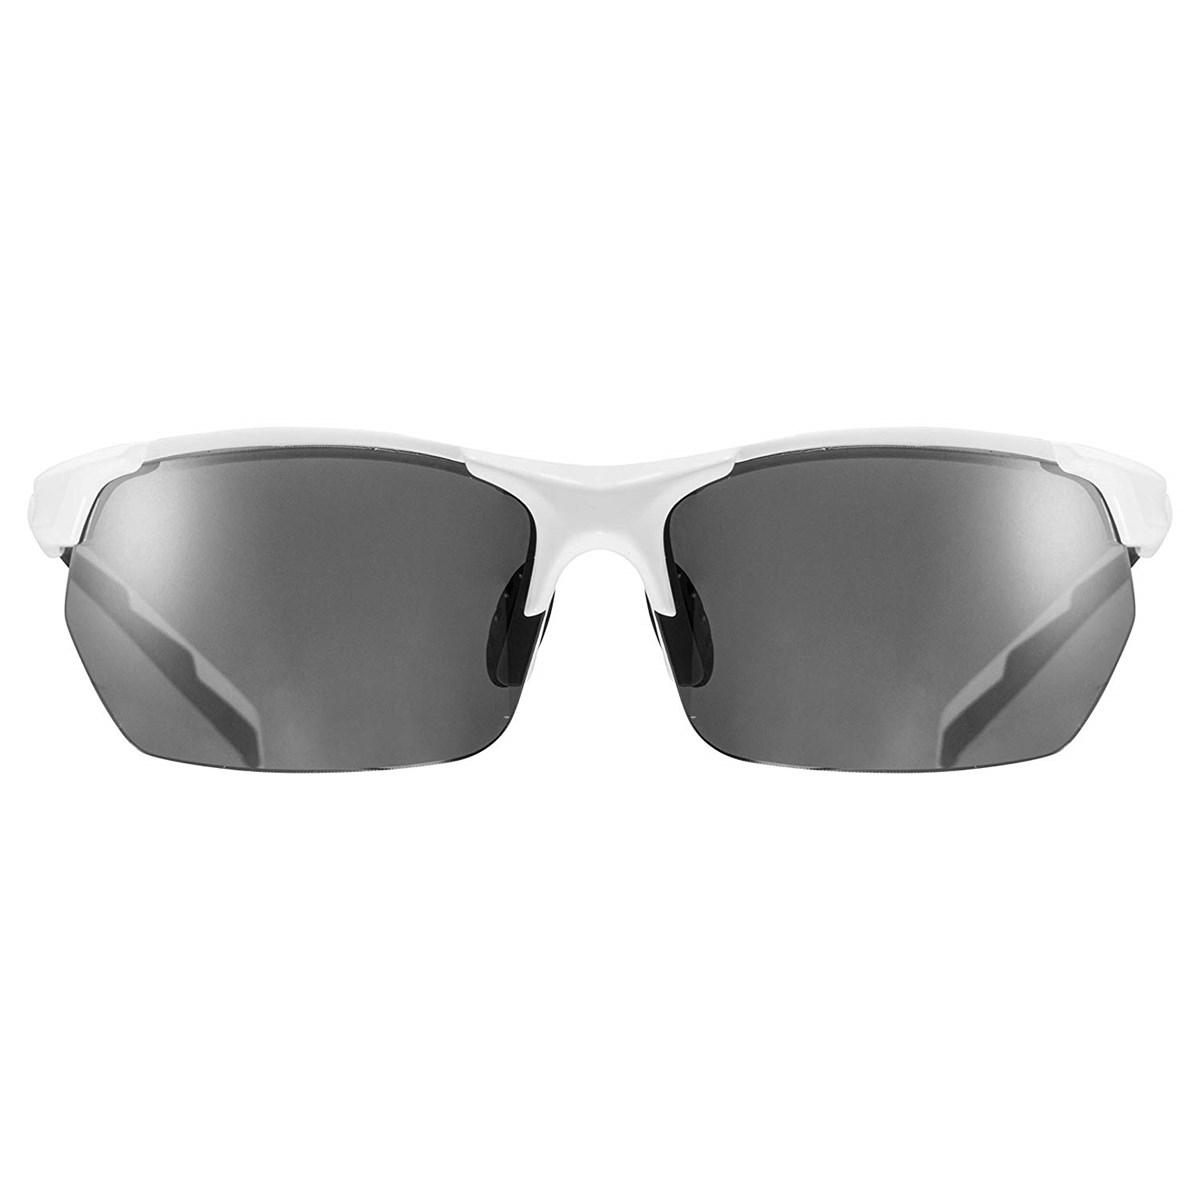 dbb4397c11 Uvex Sportstyle 114 Sunglasses 2019 White   Silver £54.95